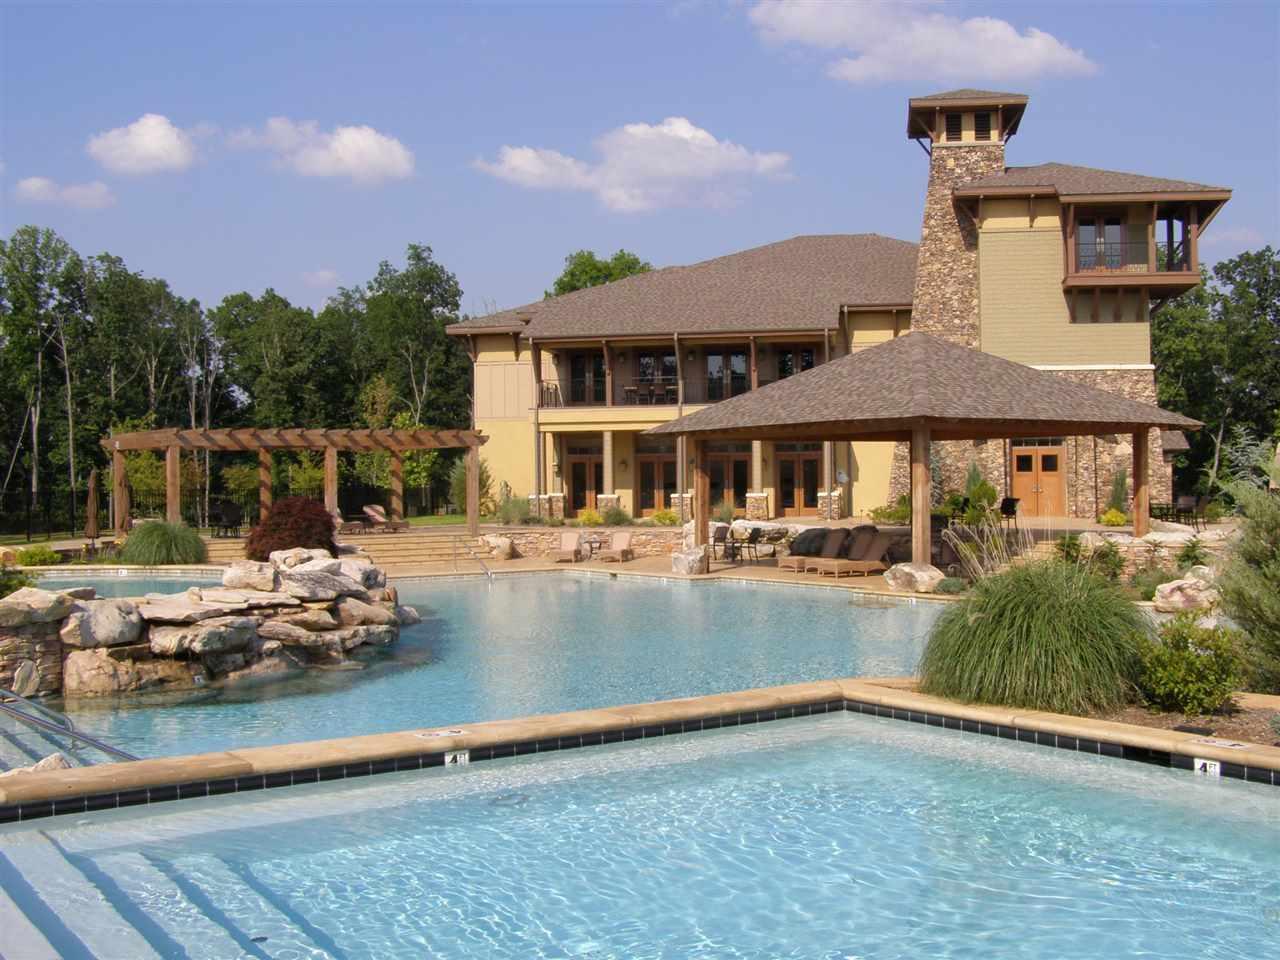 95 Gentle Ridge Savannah, TN 38372 - MLS #: 9997995